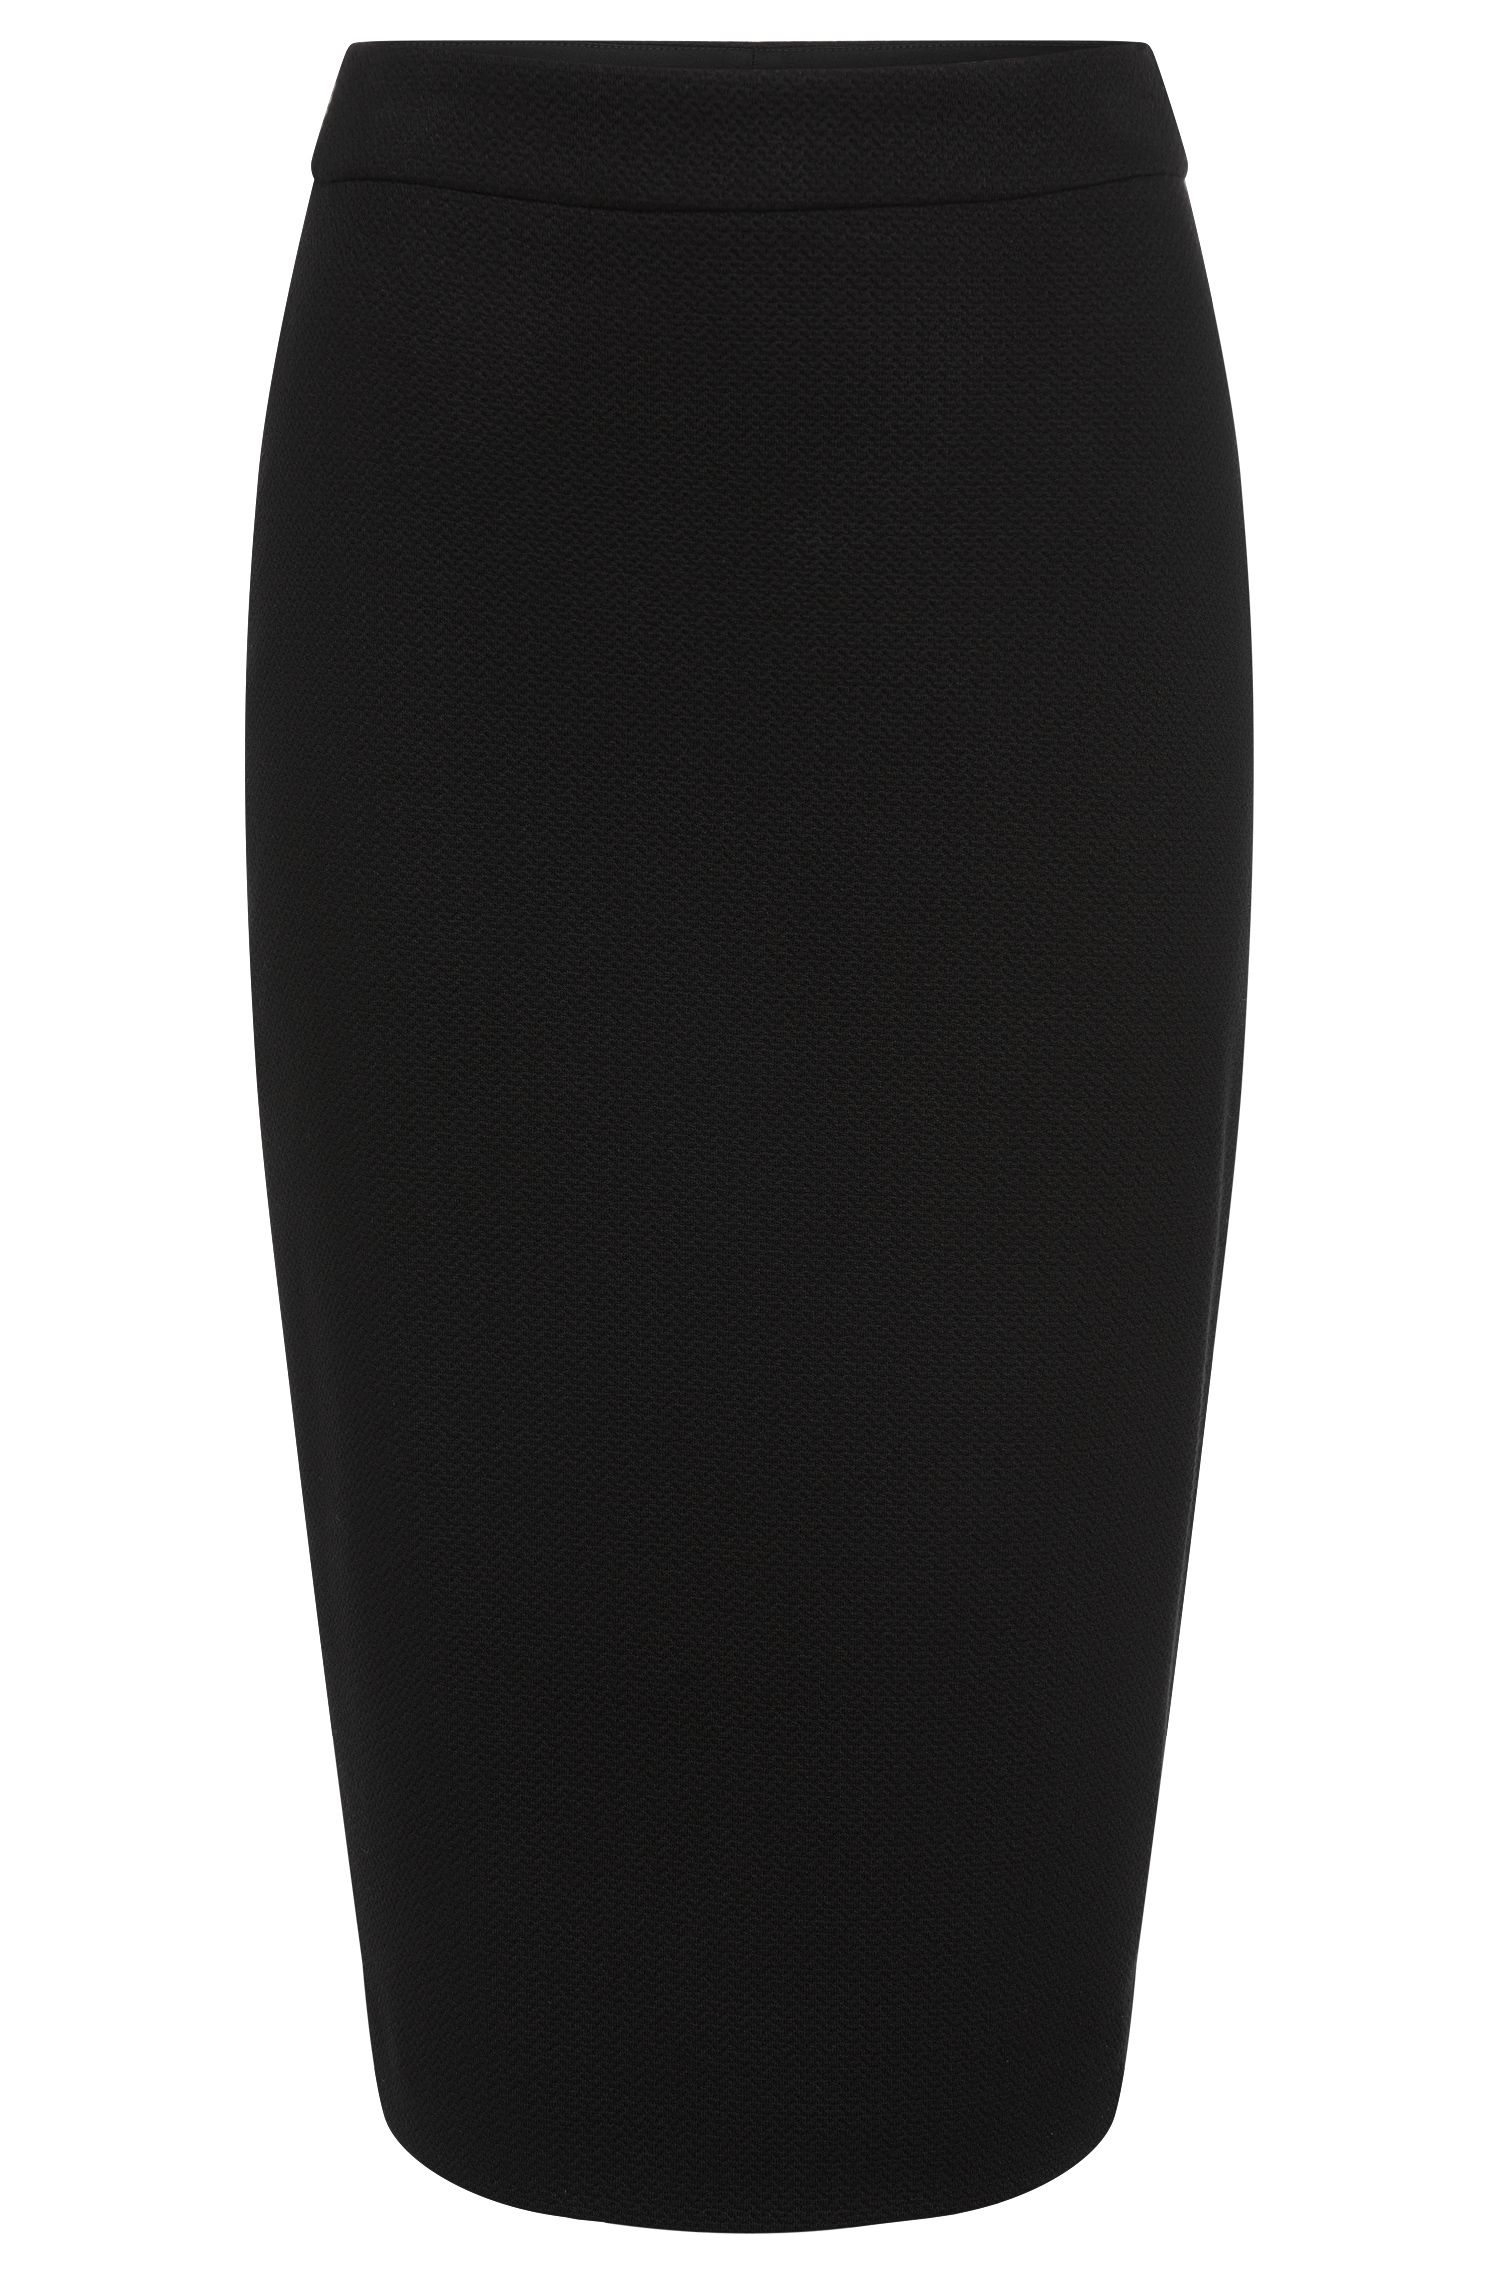 'Melala' | Stretch Viscose Textured Pencil Skirt